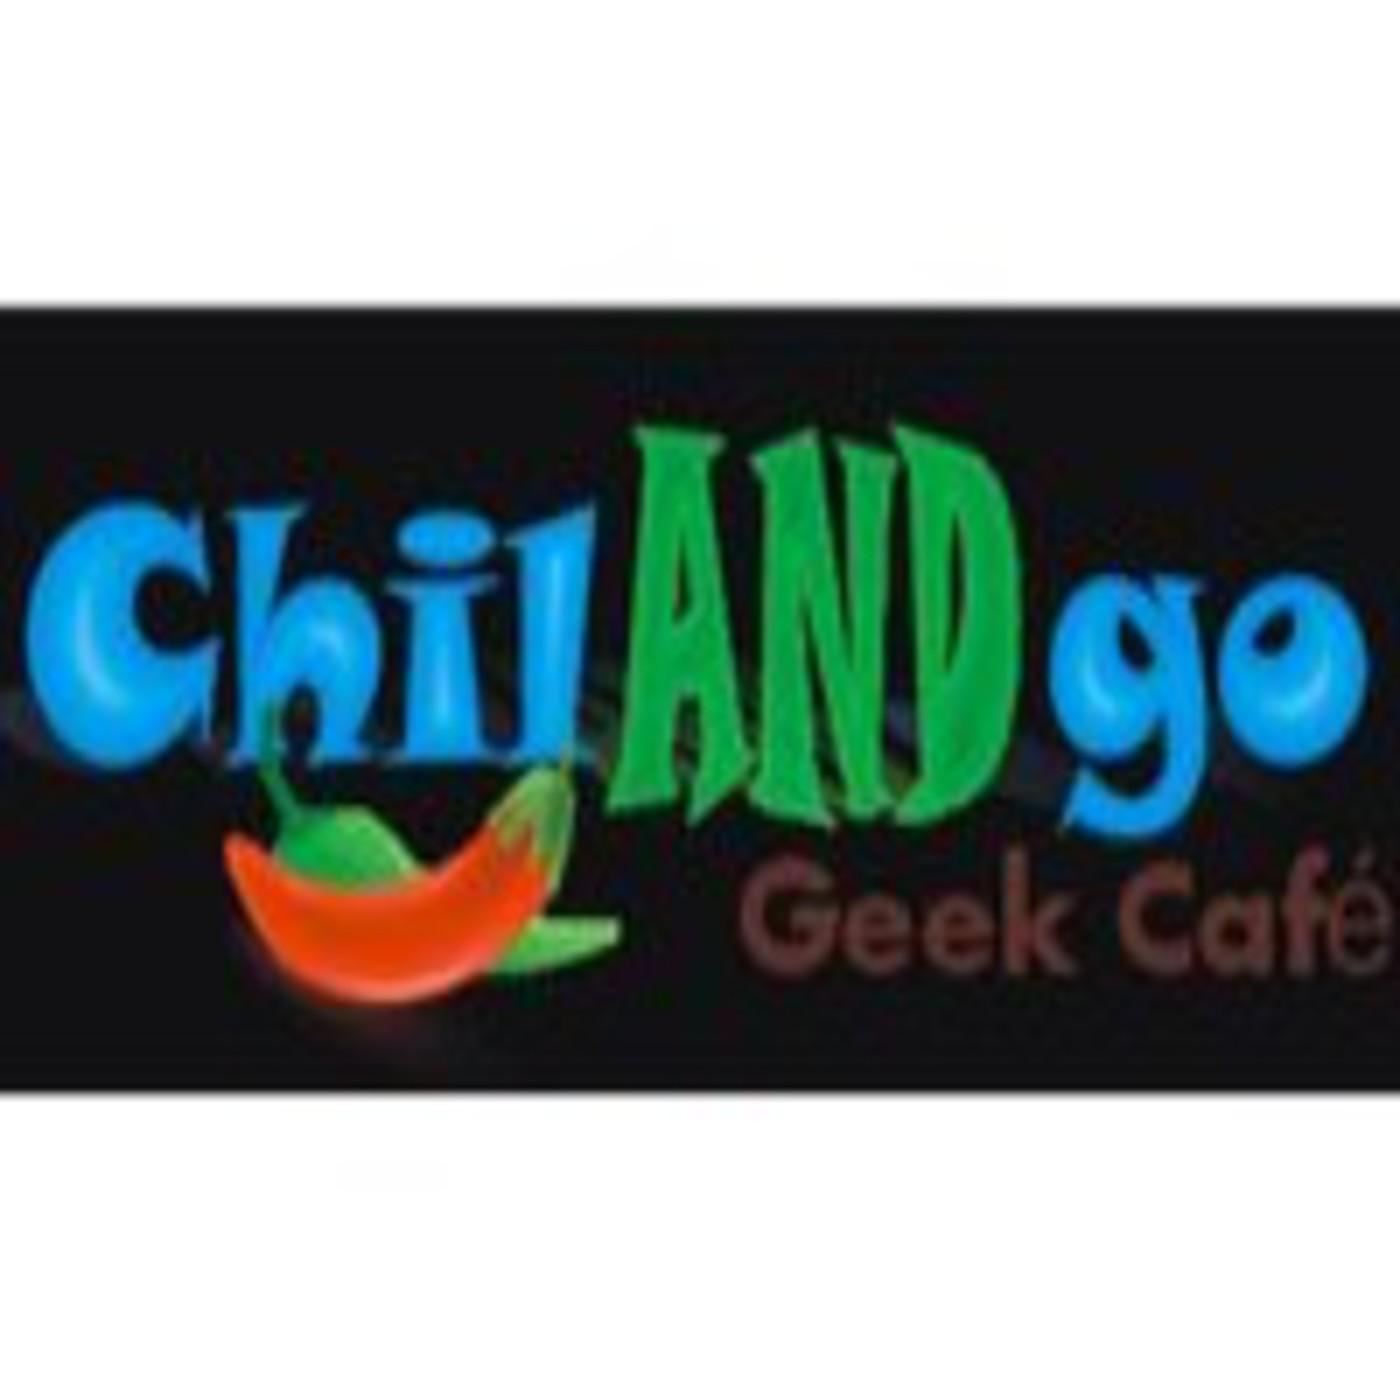 <![CDATA[chilANDgo Geek Cafe]]>